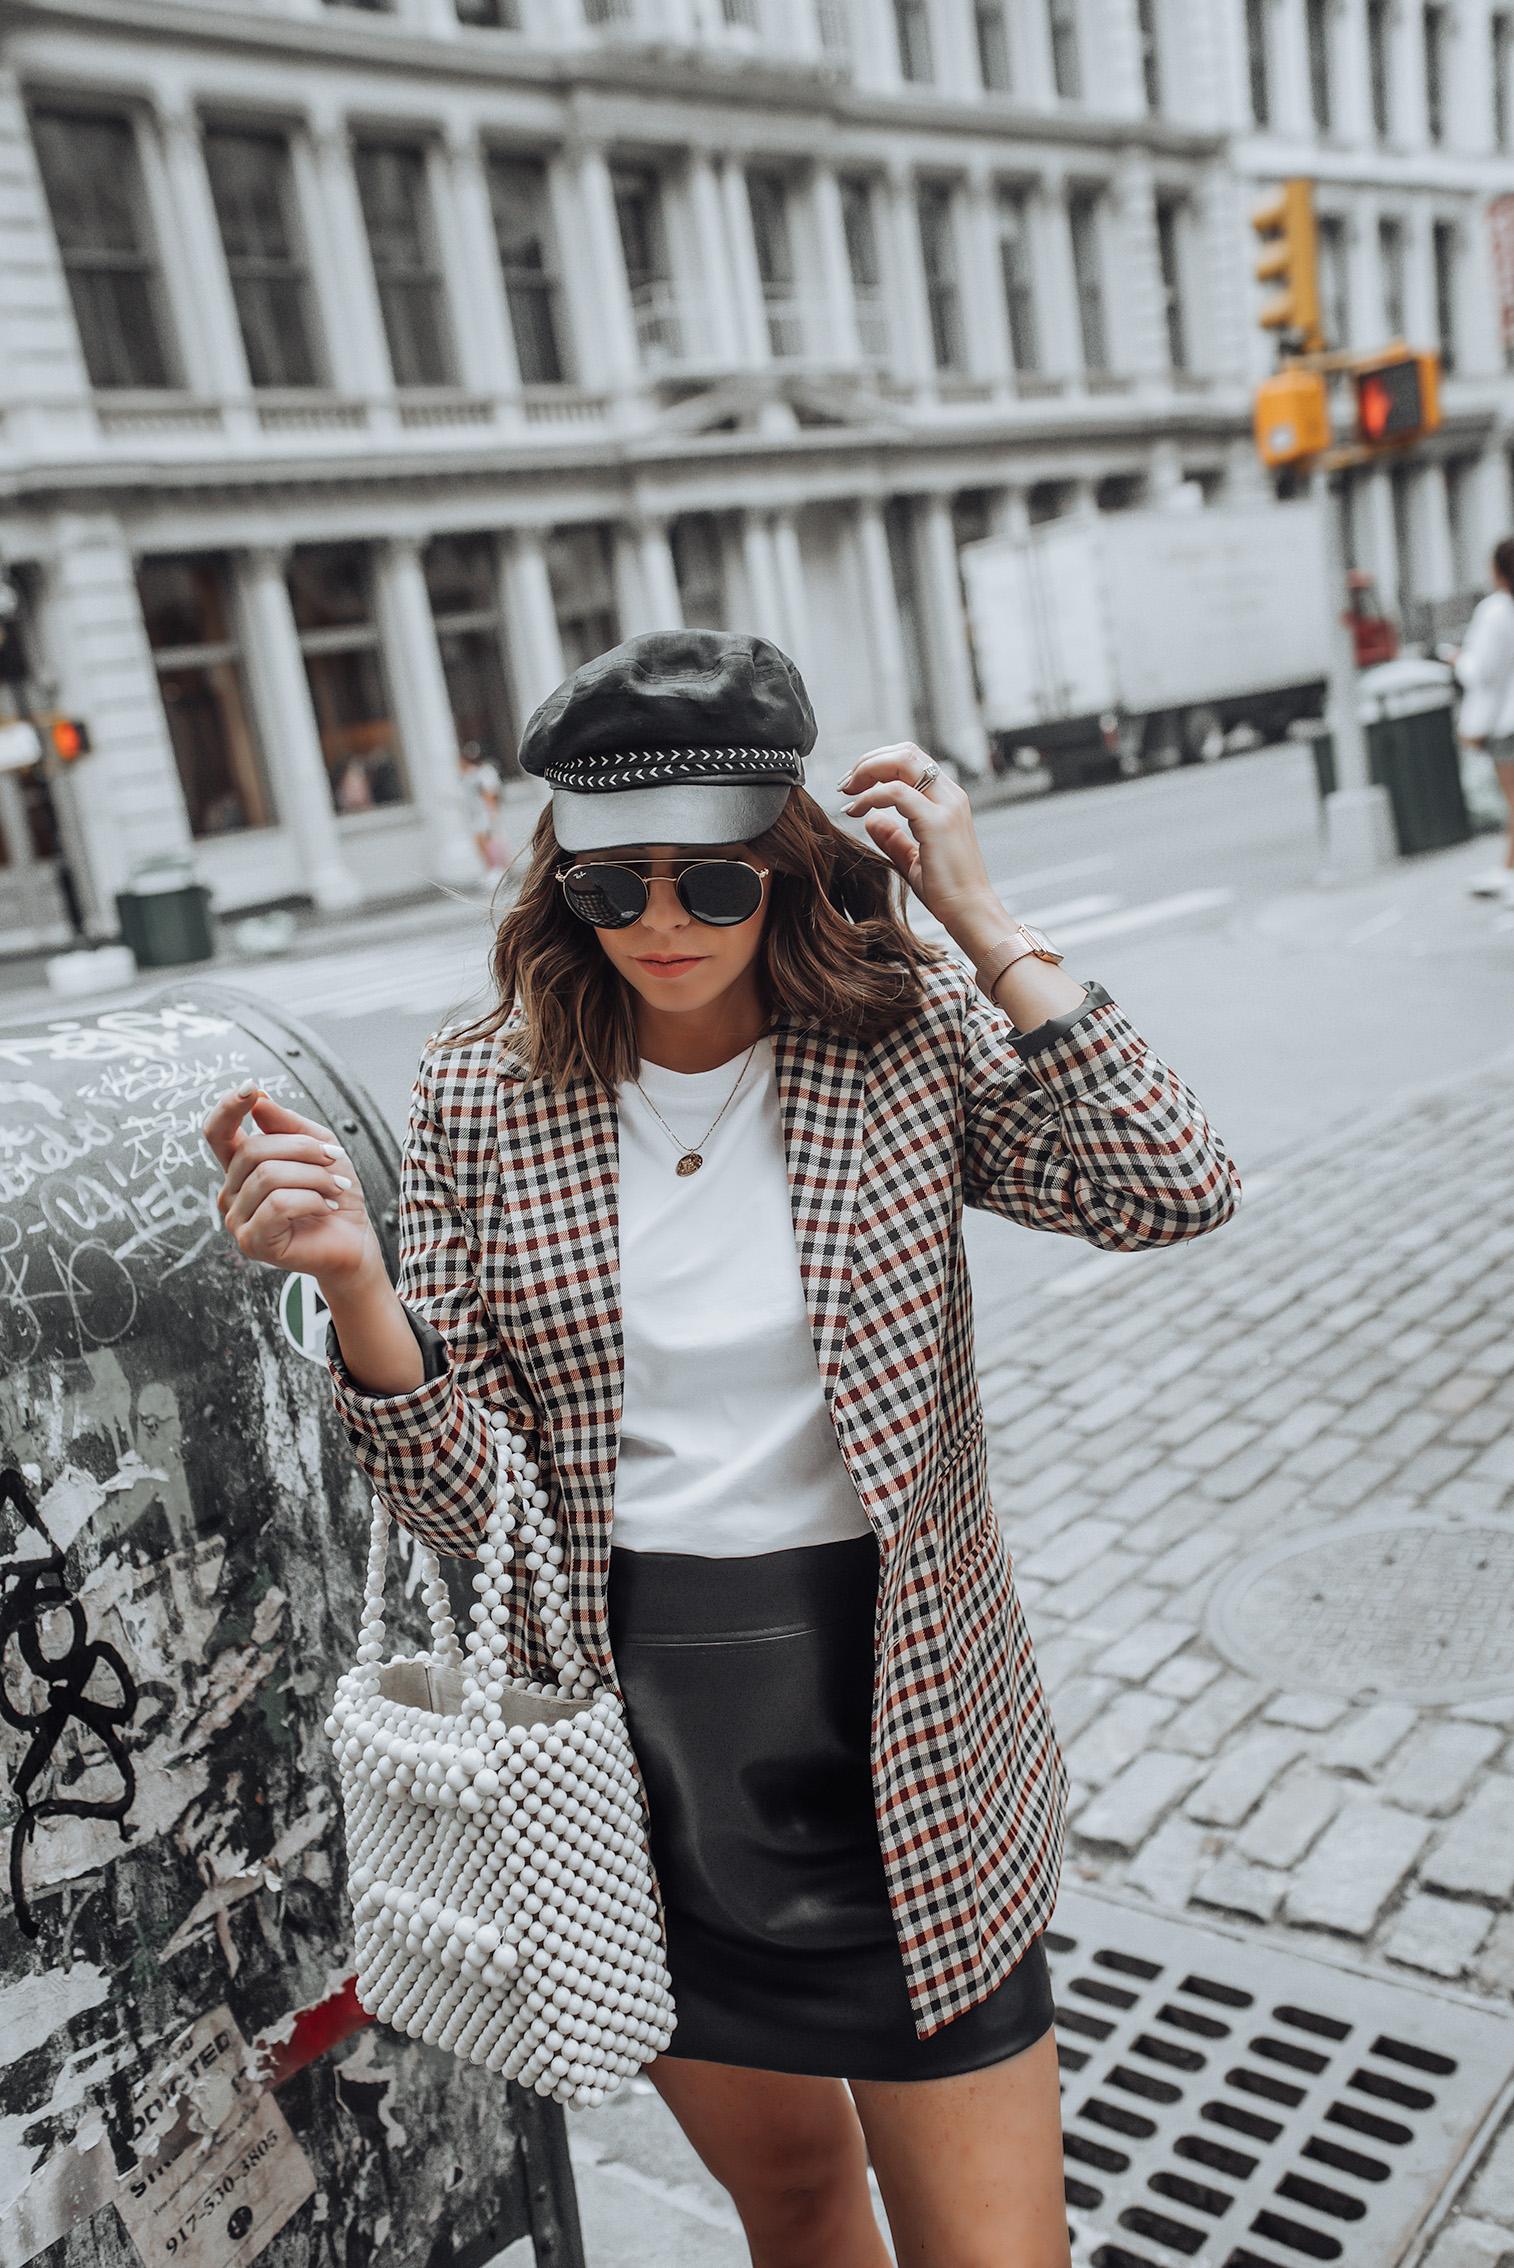 NYFW Check print |Check Blazer | H&M Skirt | Beaded Handbag | Lo Fi Sneaker #streetstyle #ootd #asos #checkprint